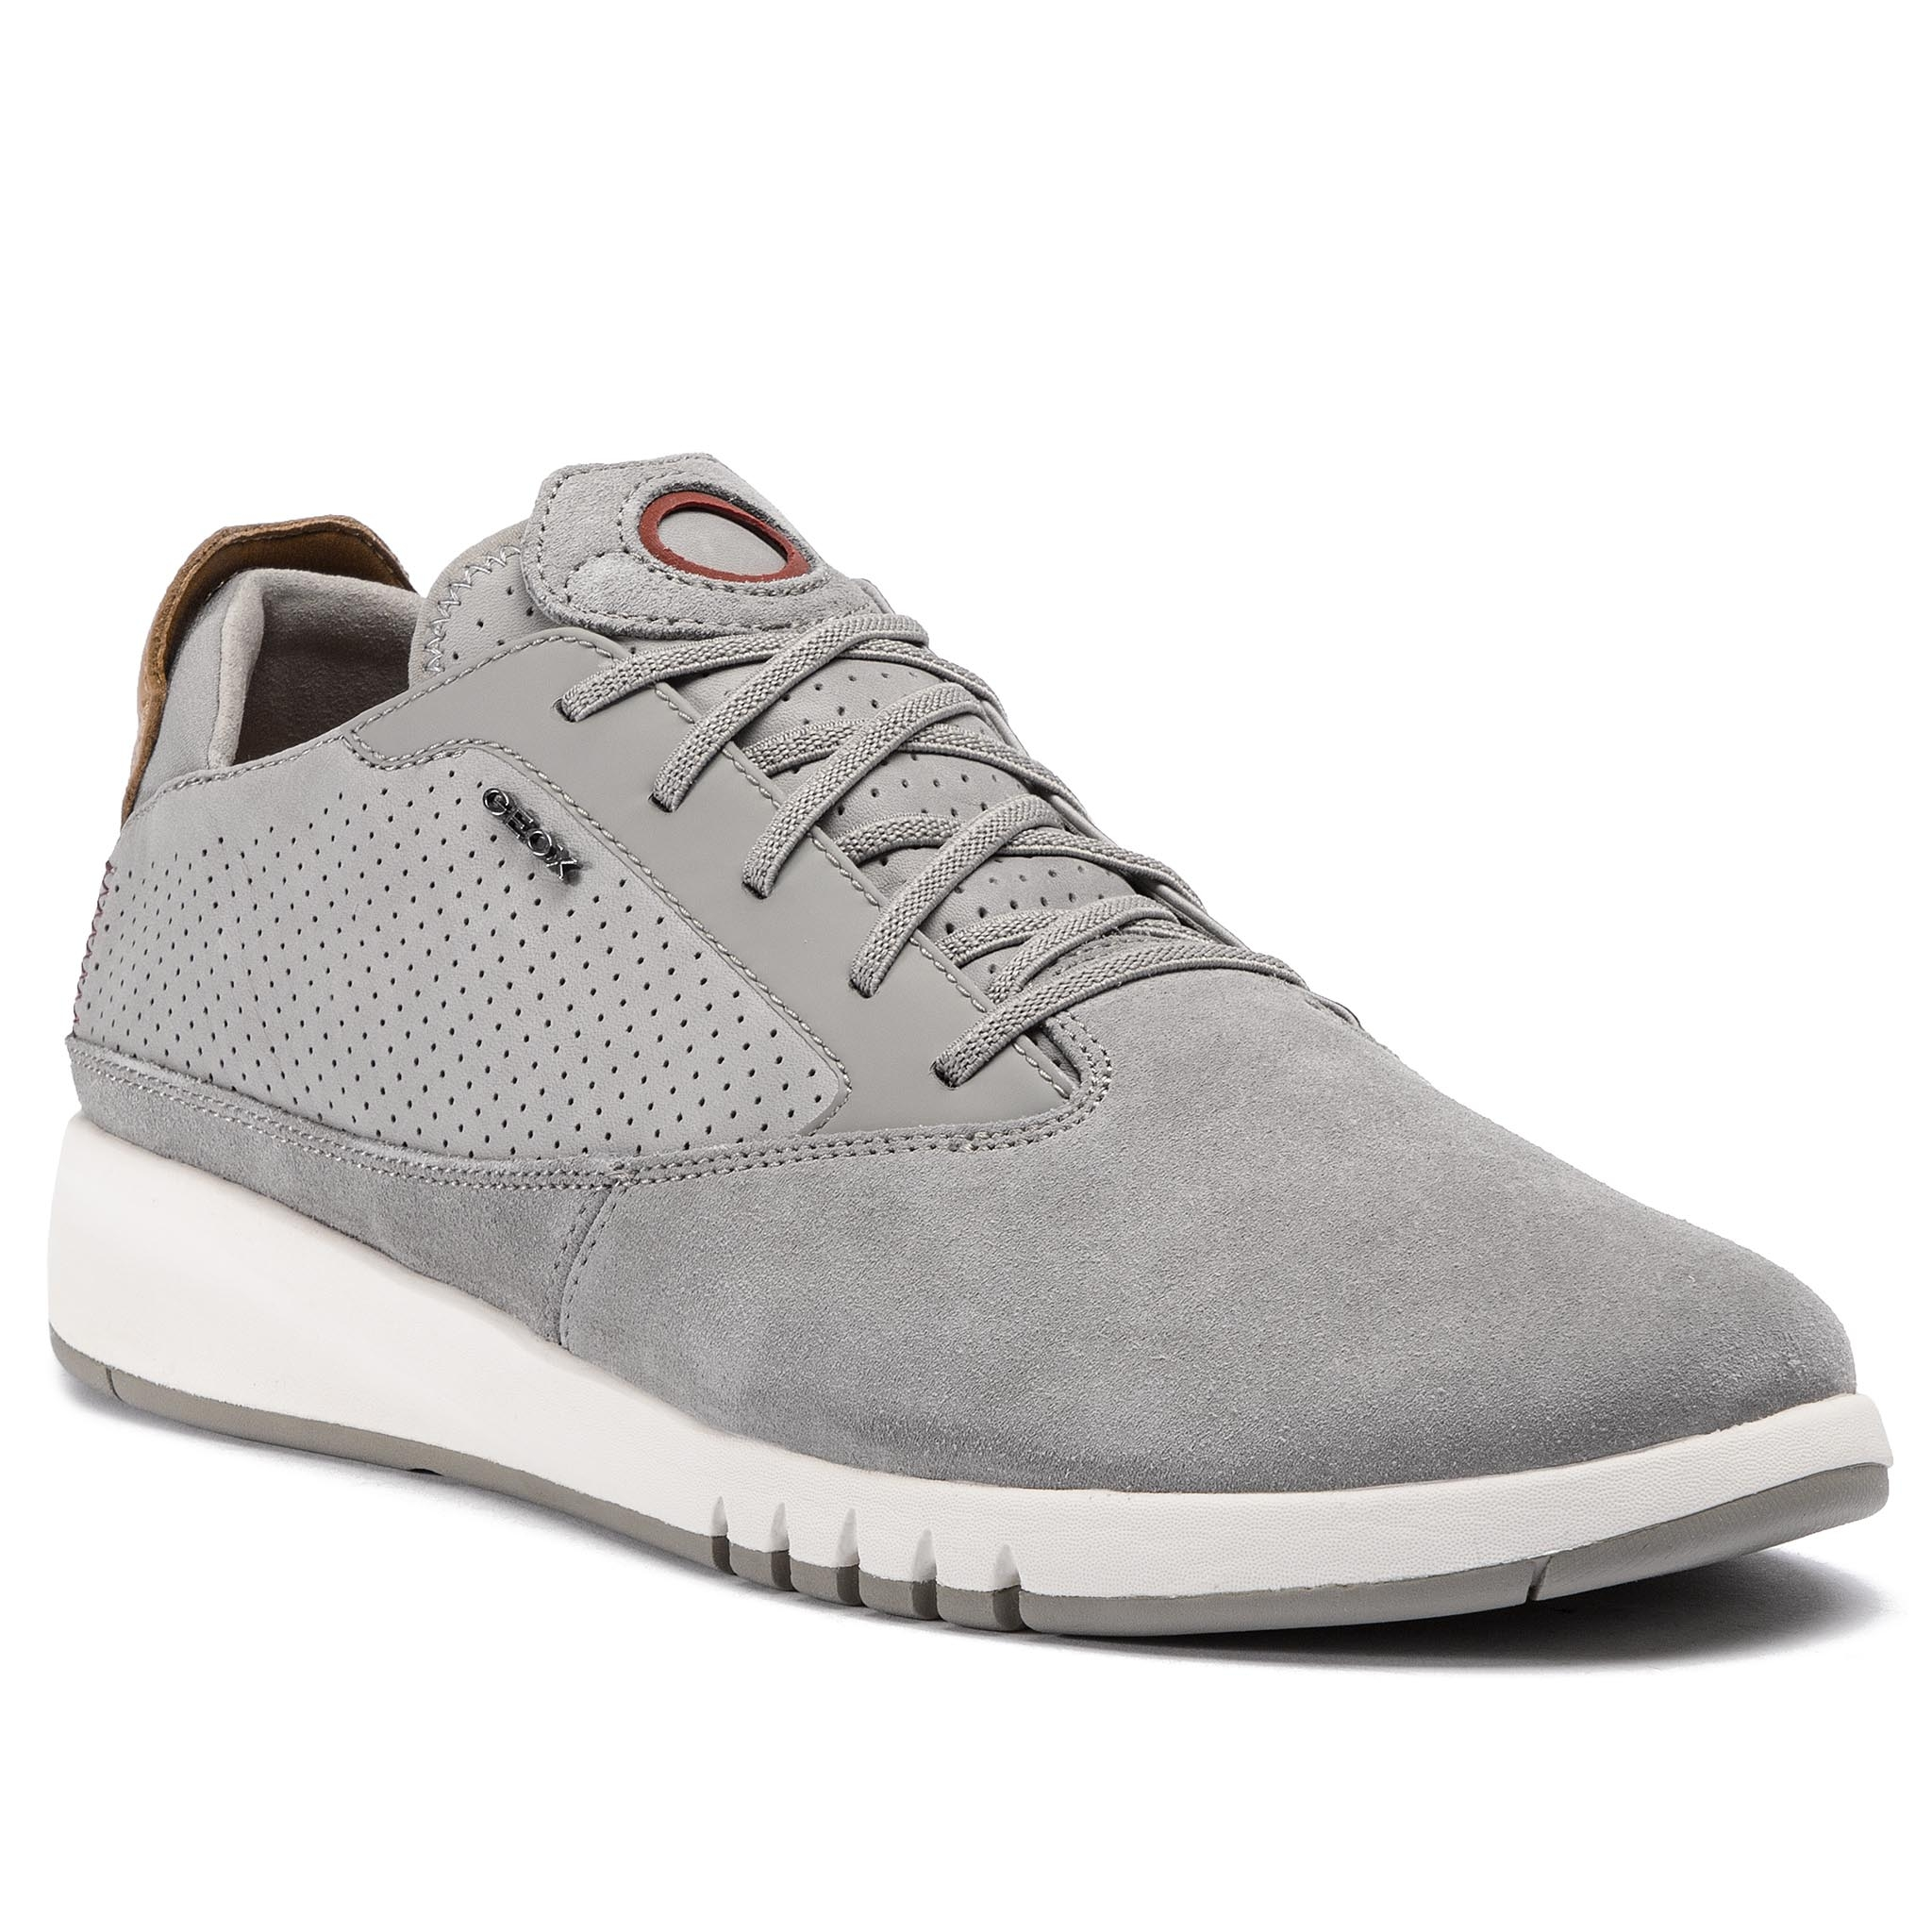 Aerantis C9999 00043 Black U927fa U Sneakers Geox A Ercxwqbod gb7yf6